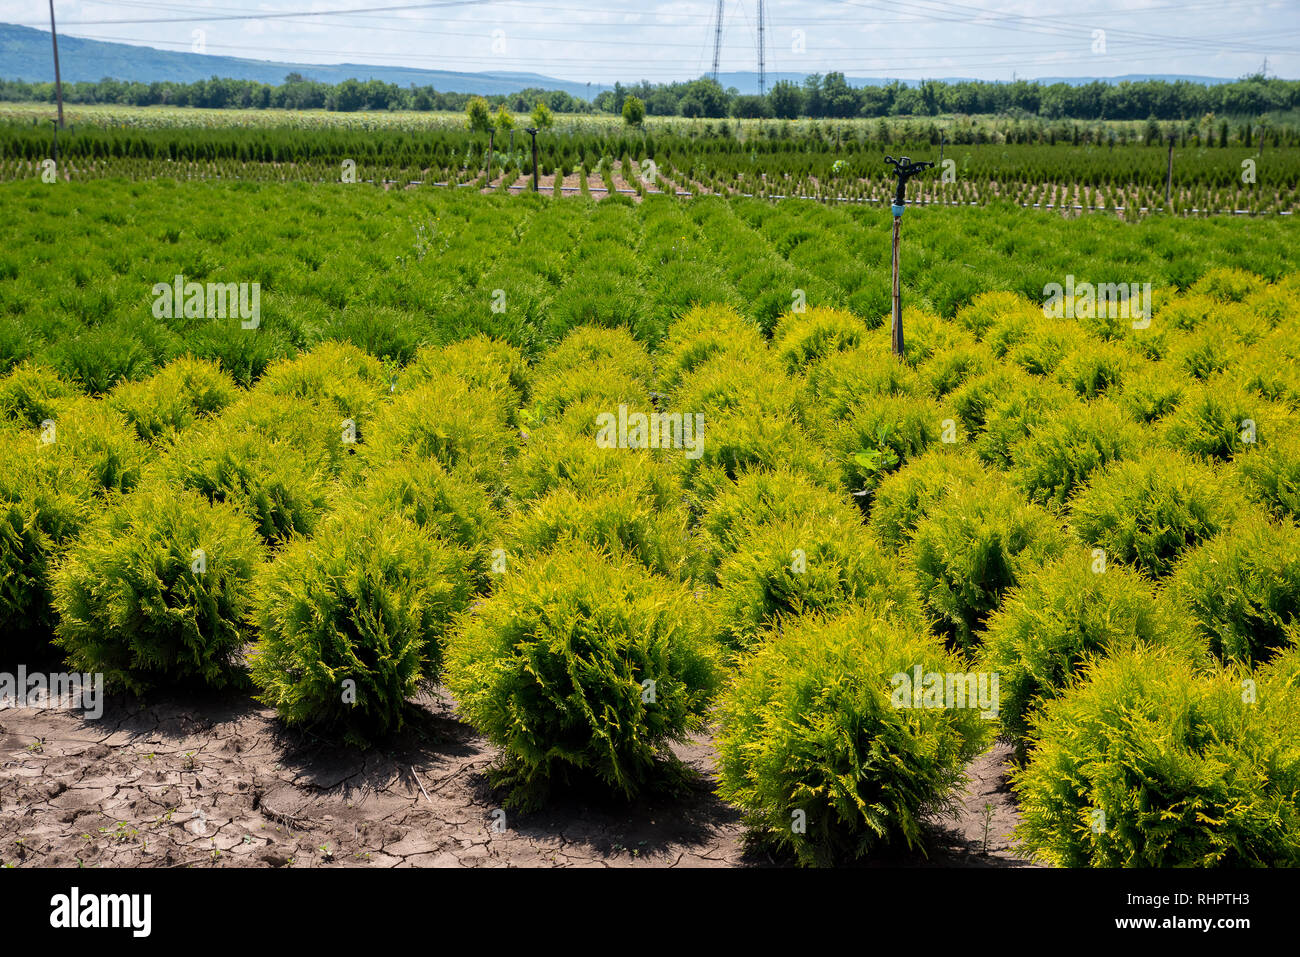 Nursery for Cedar. Natural green conifer thuja planting garden outdoor. - Stock Image